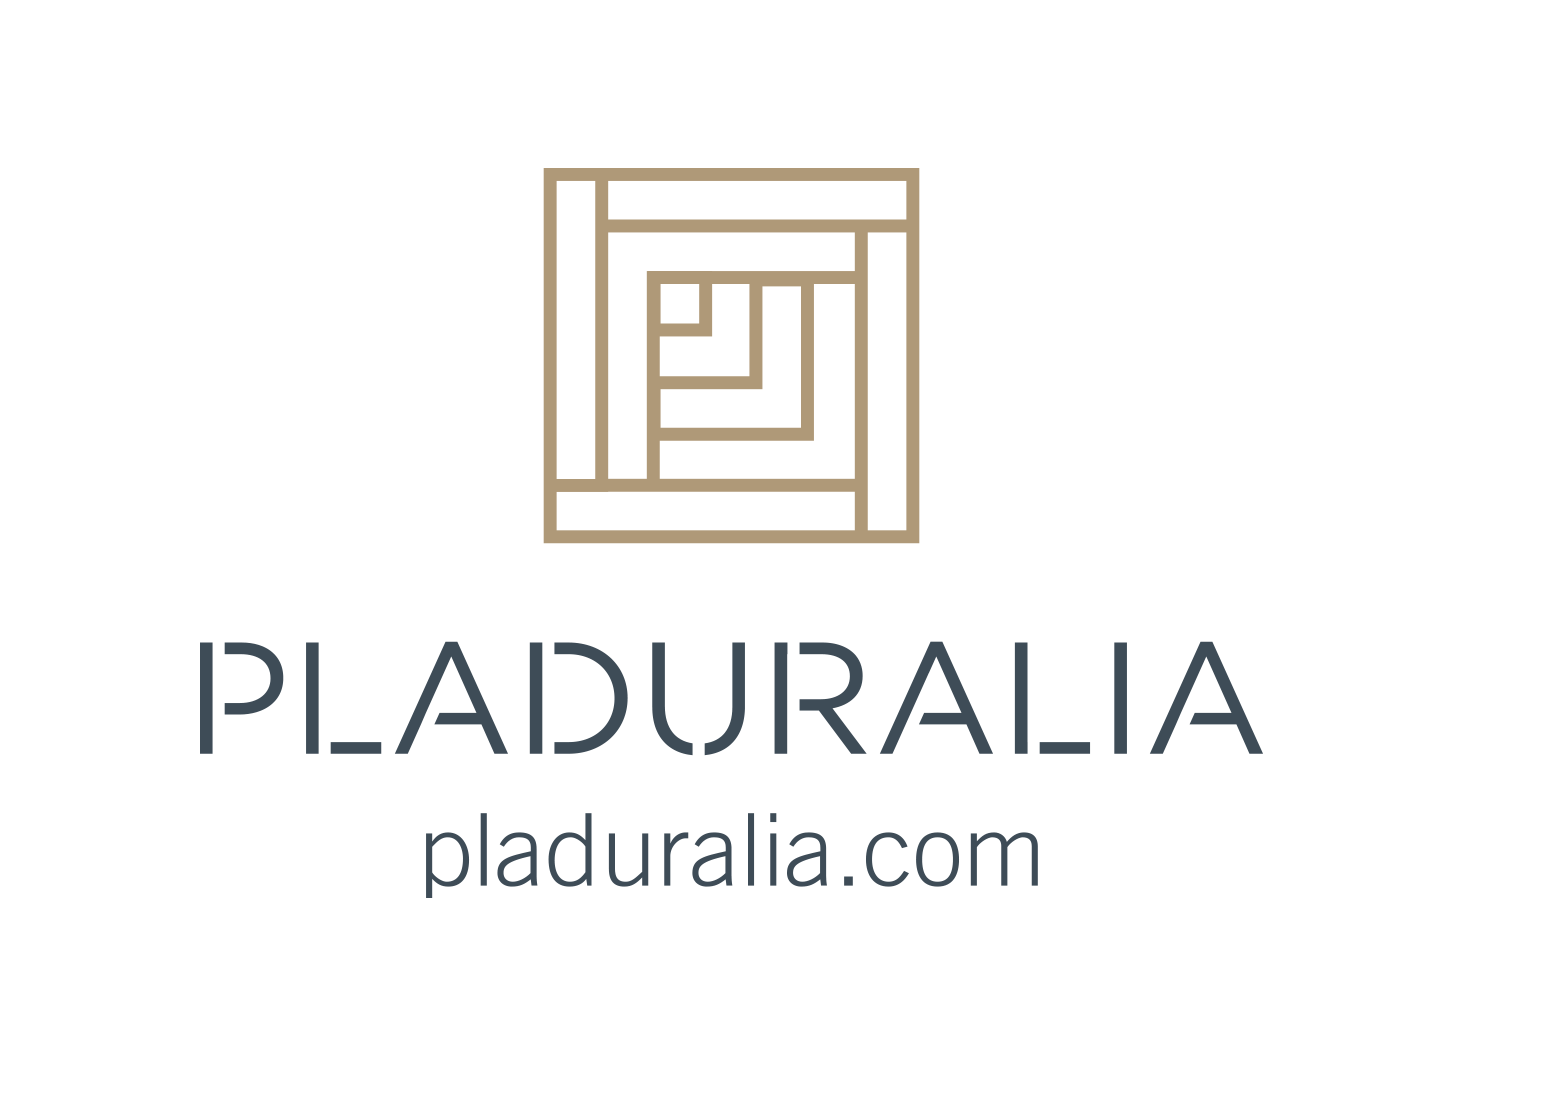 Pladuralia